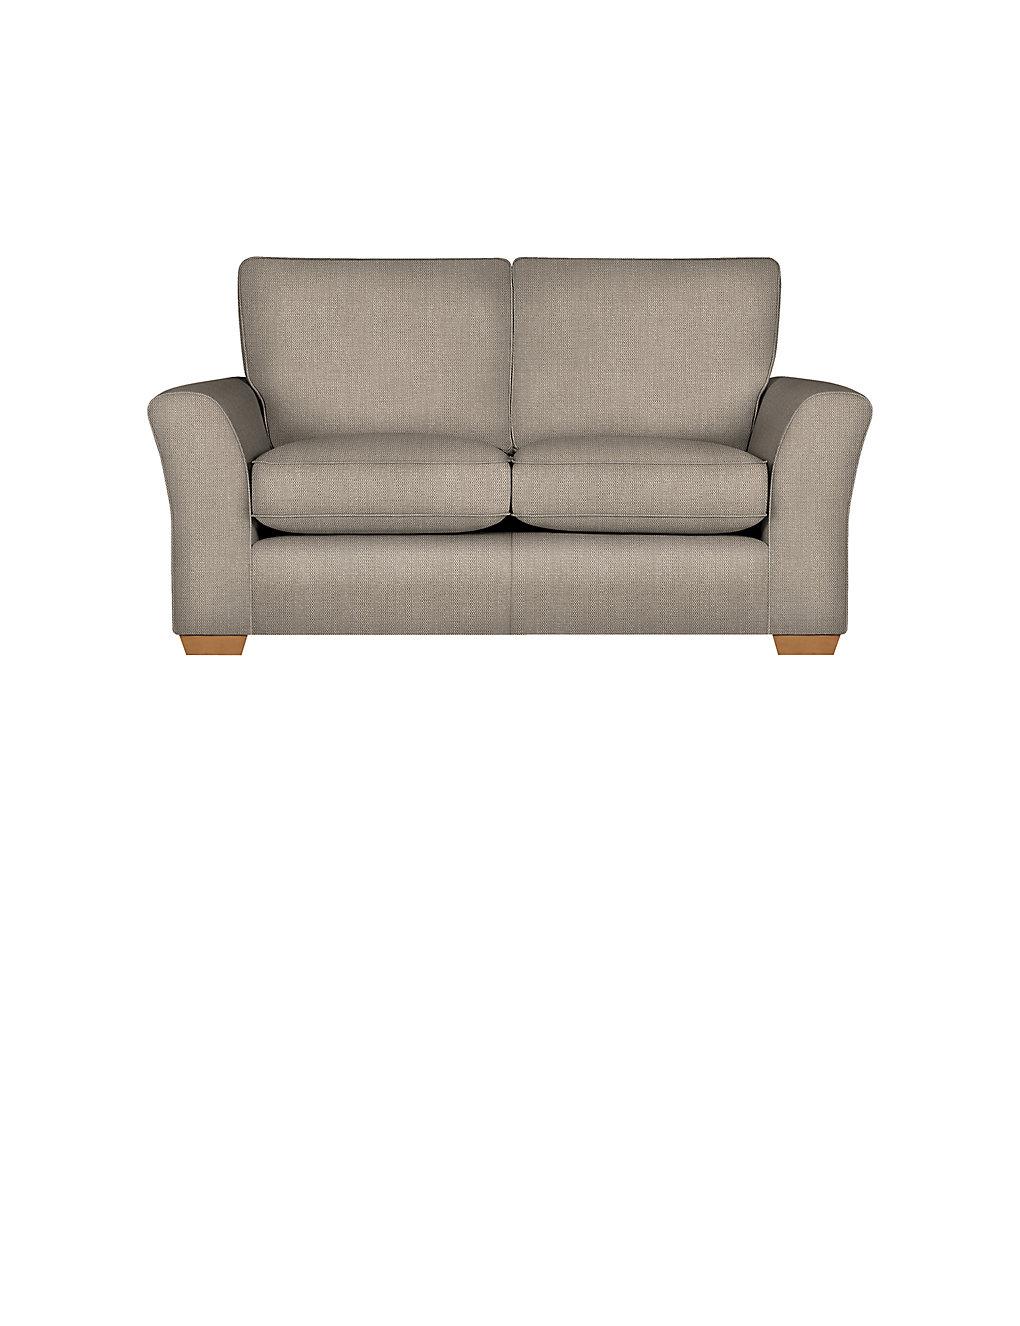 Lincoln Small Sofa. Lincoln Furniture   Lincoln Sofa   Armchair Range   M S